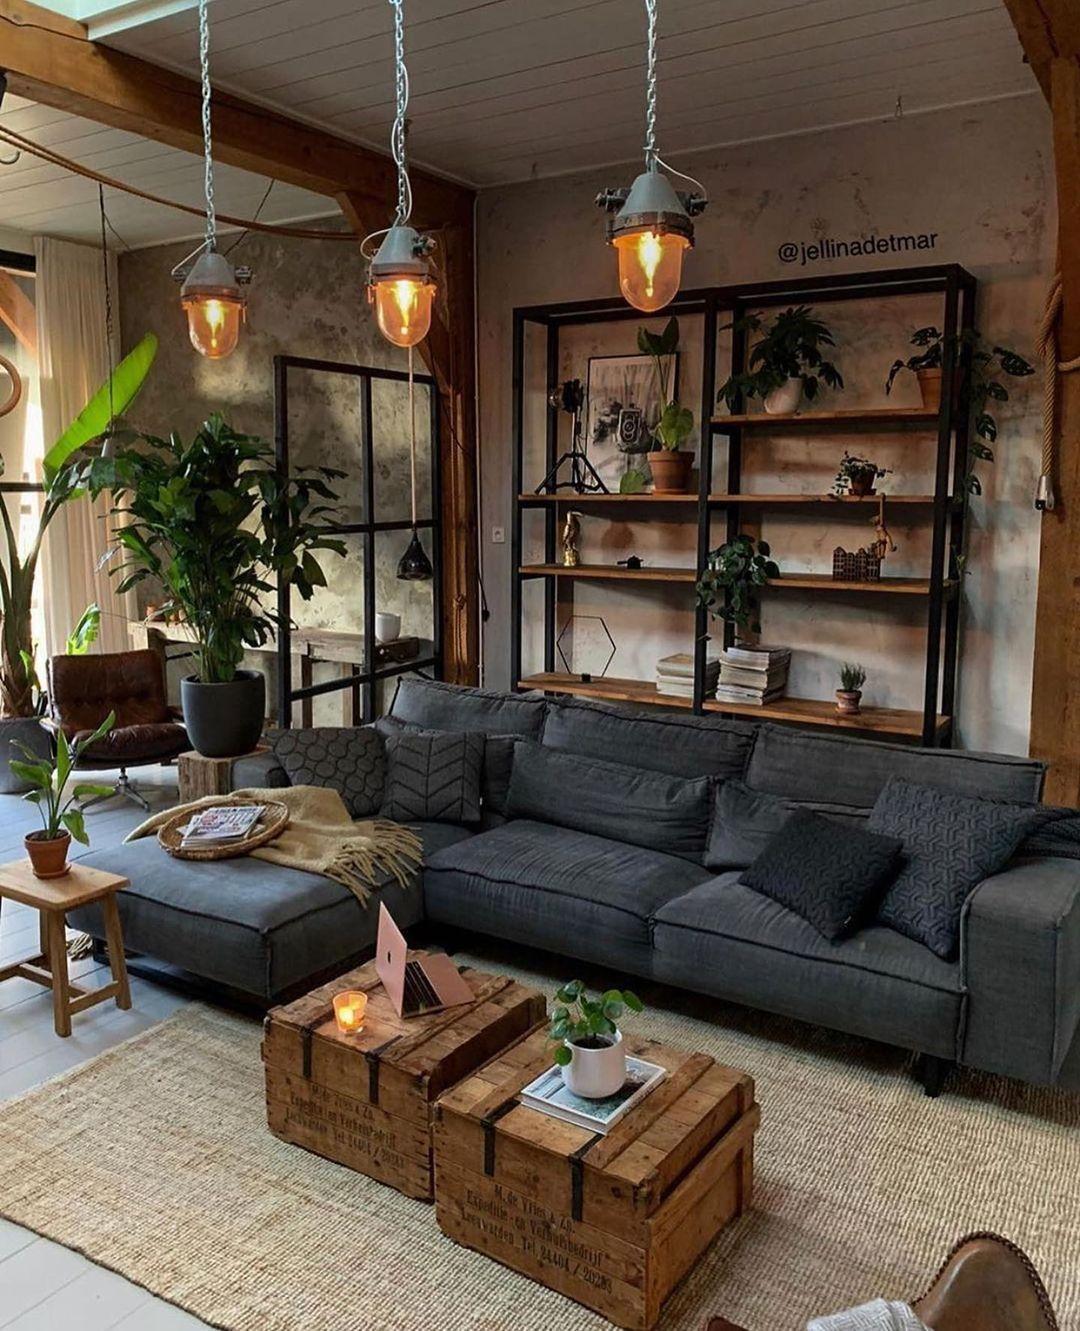 aesthetic Rustic living room